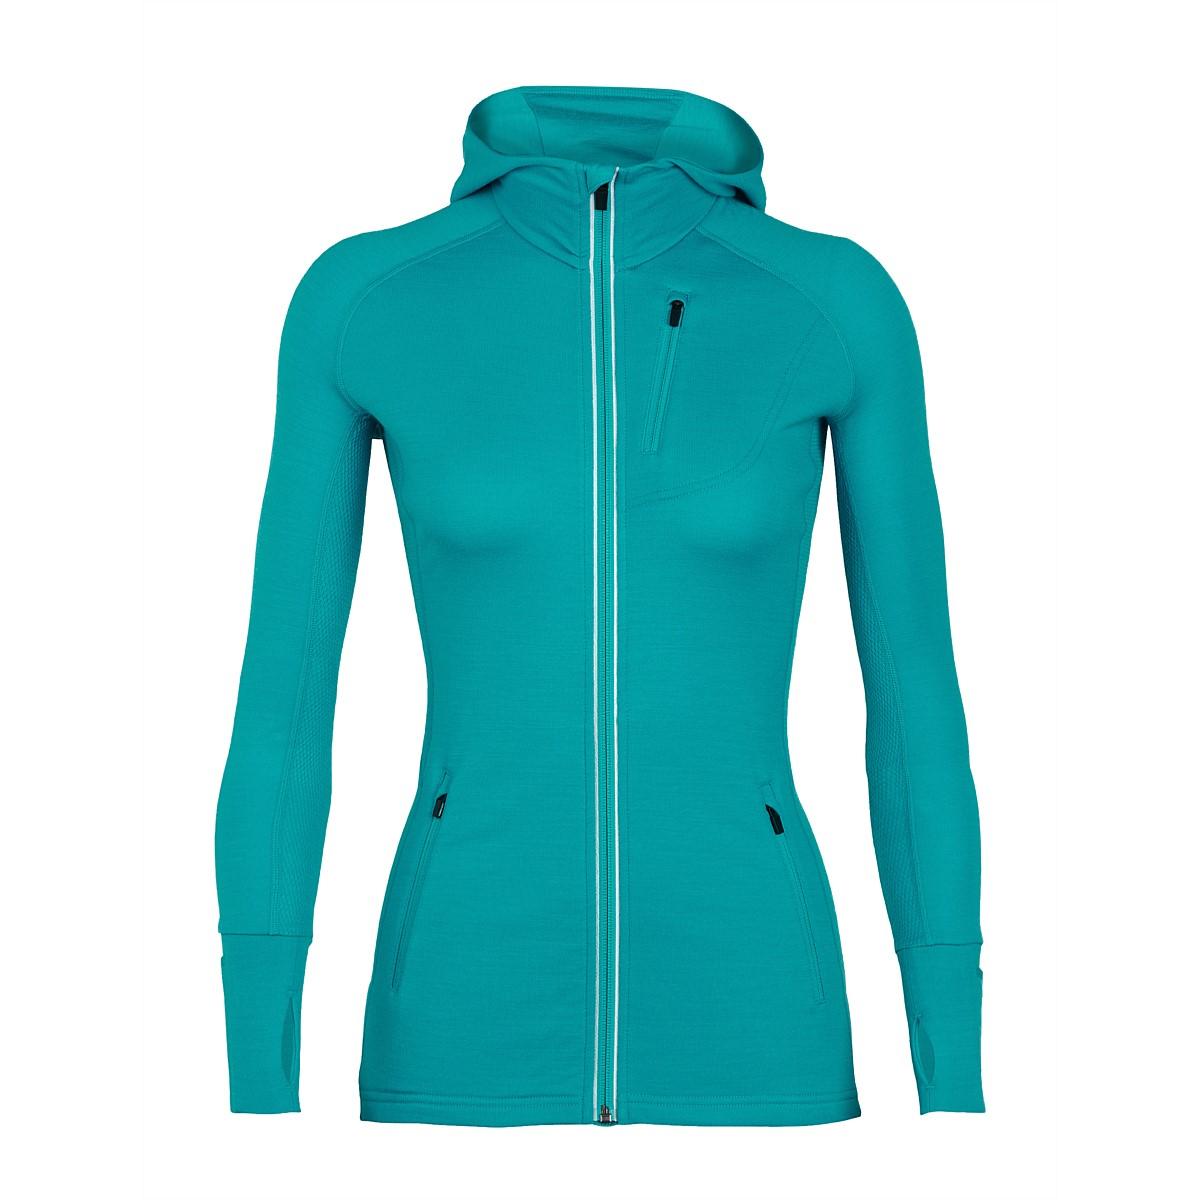 929041d17a Womens - Icebreaker Women's Quantum Long Sleeve Zip Hood